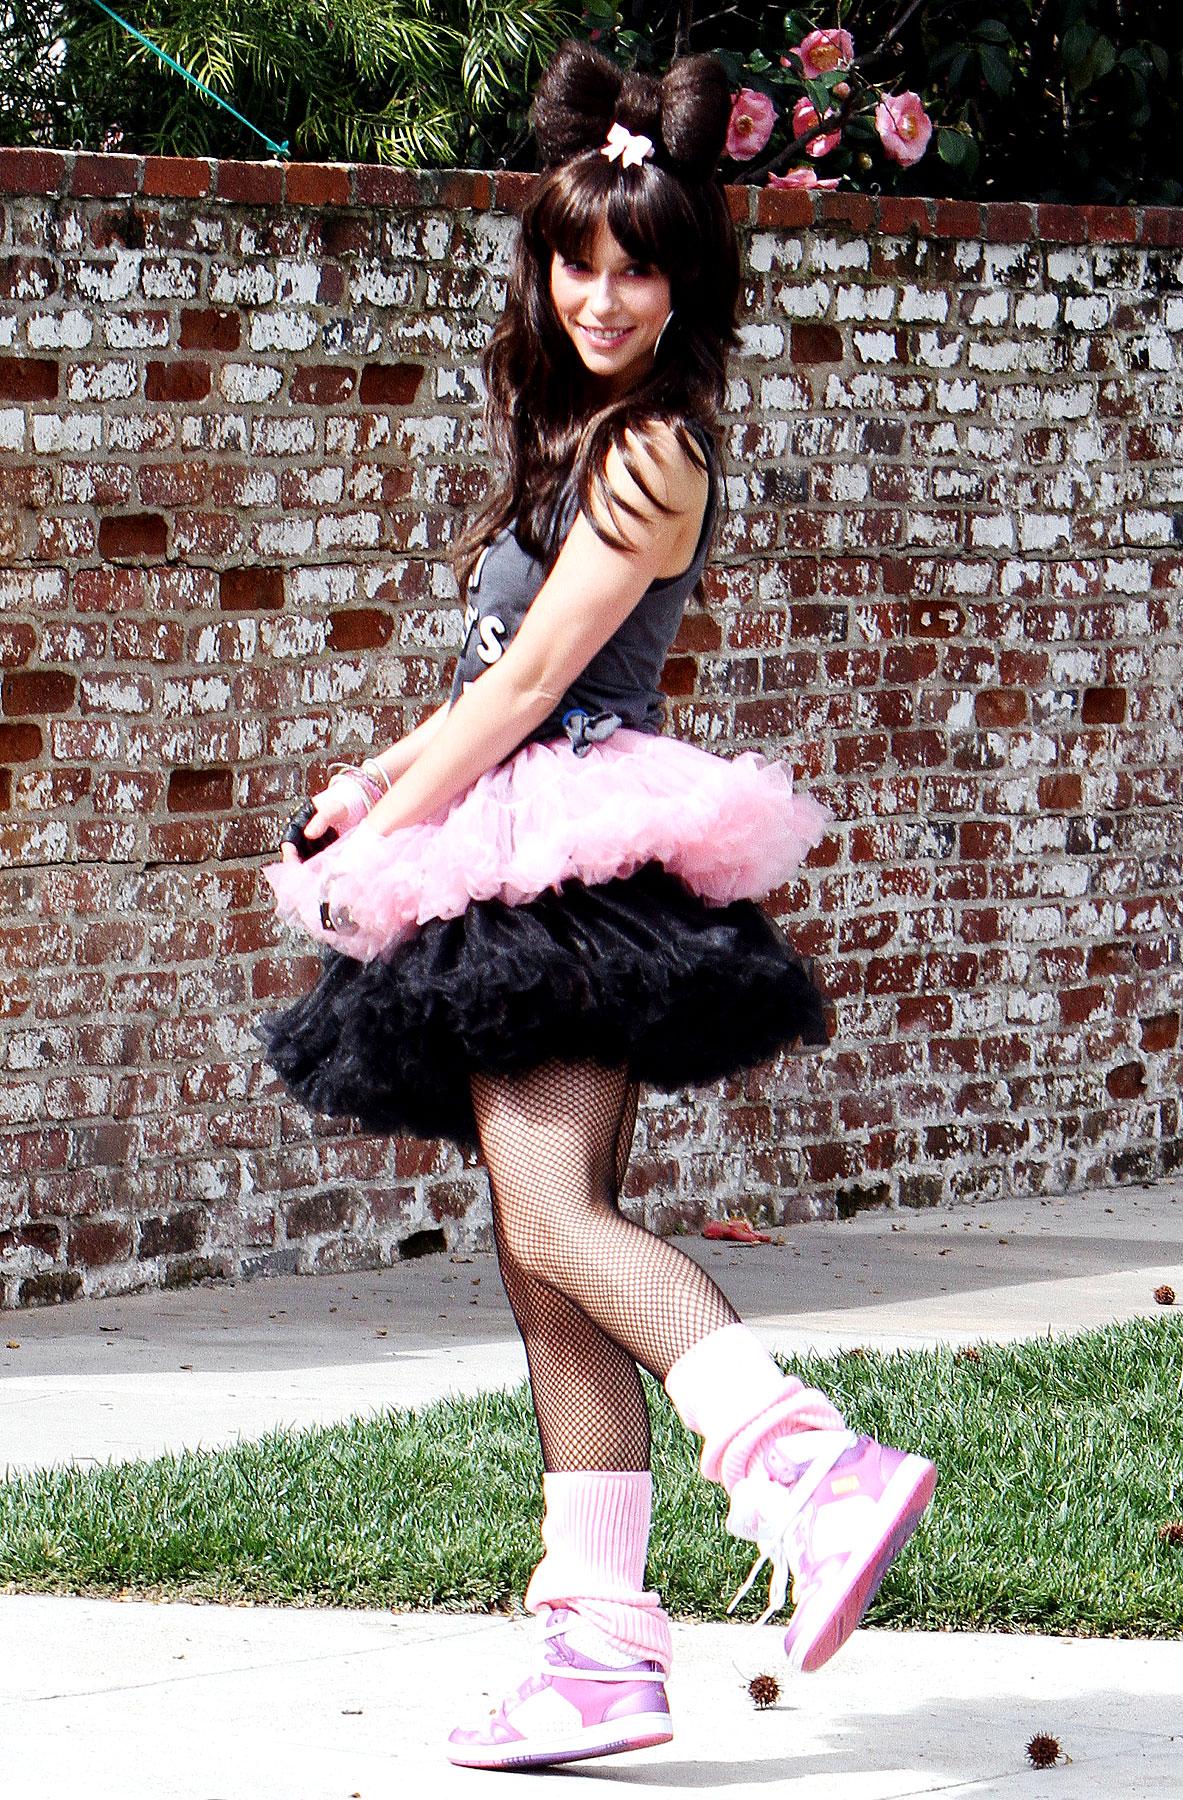 Jennifer Love Hewitt Celebrates Her Birthday By Dressing Crazy Again (PHOTOS)